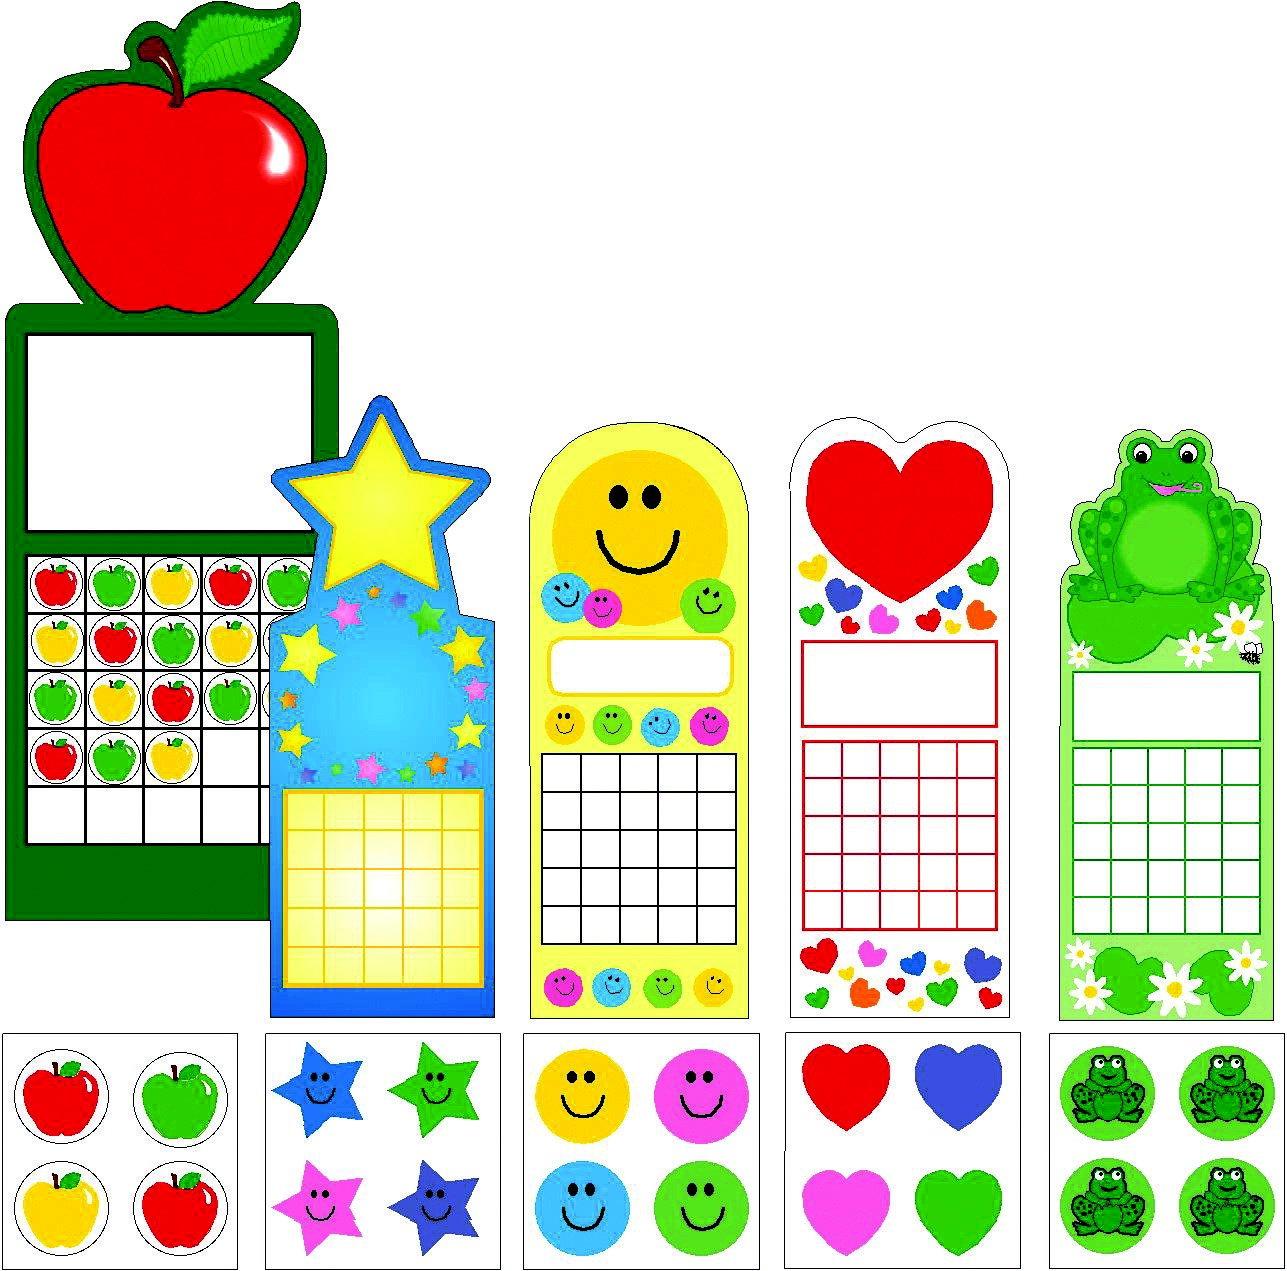 Creative Shapes Etc LLC SE-4000 5 Seasonal Designs Personal Chart and Sticker Set, 2-3/4'' x 7-1/2'' Size by Creative Shapes Etc LLC